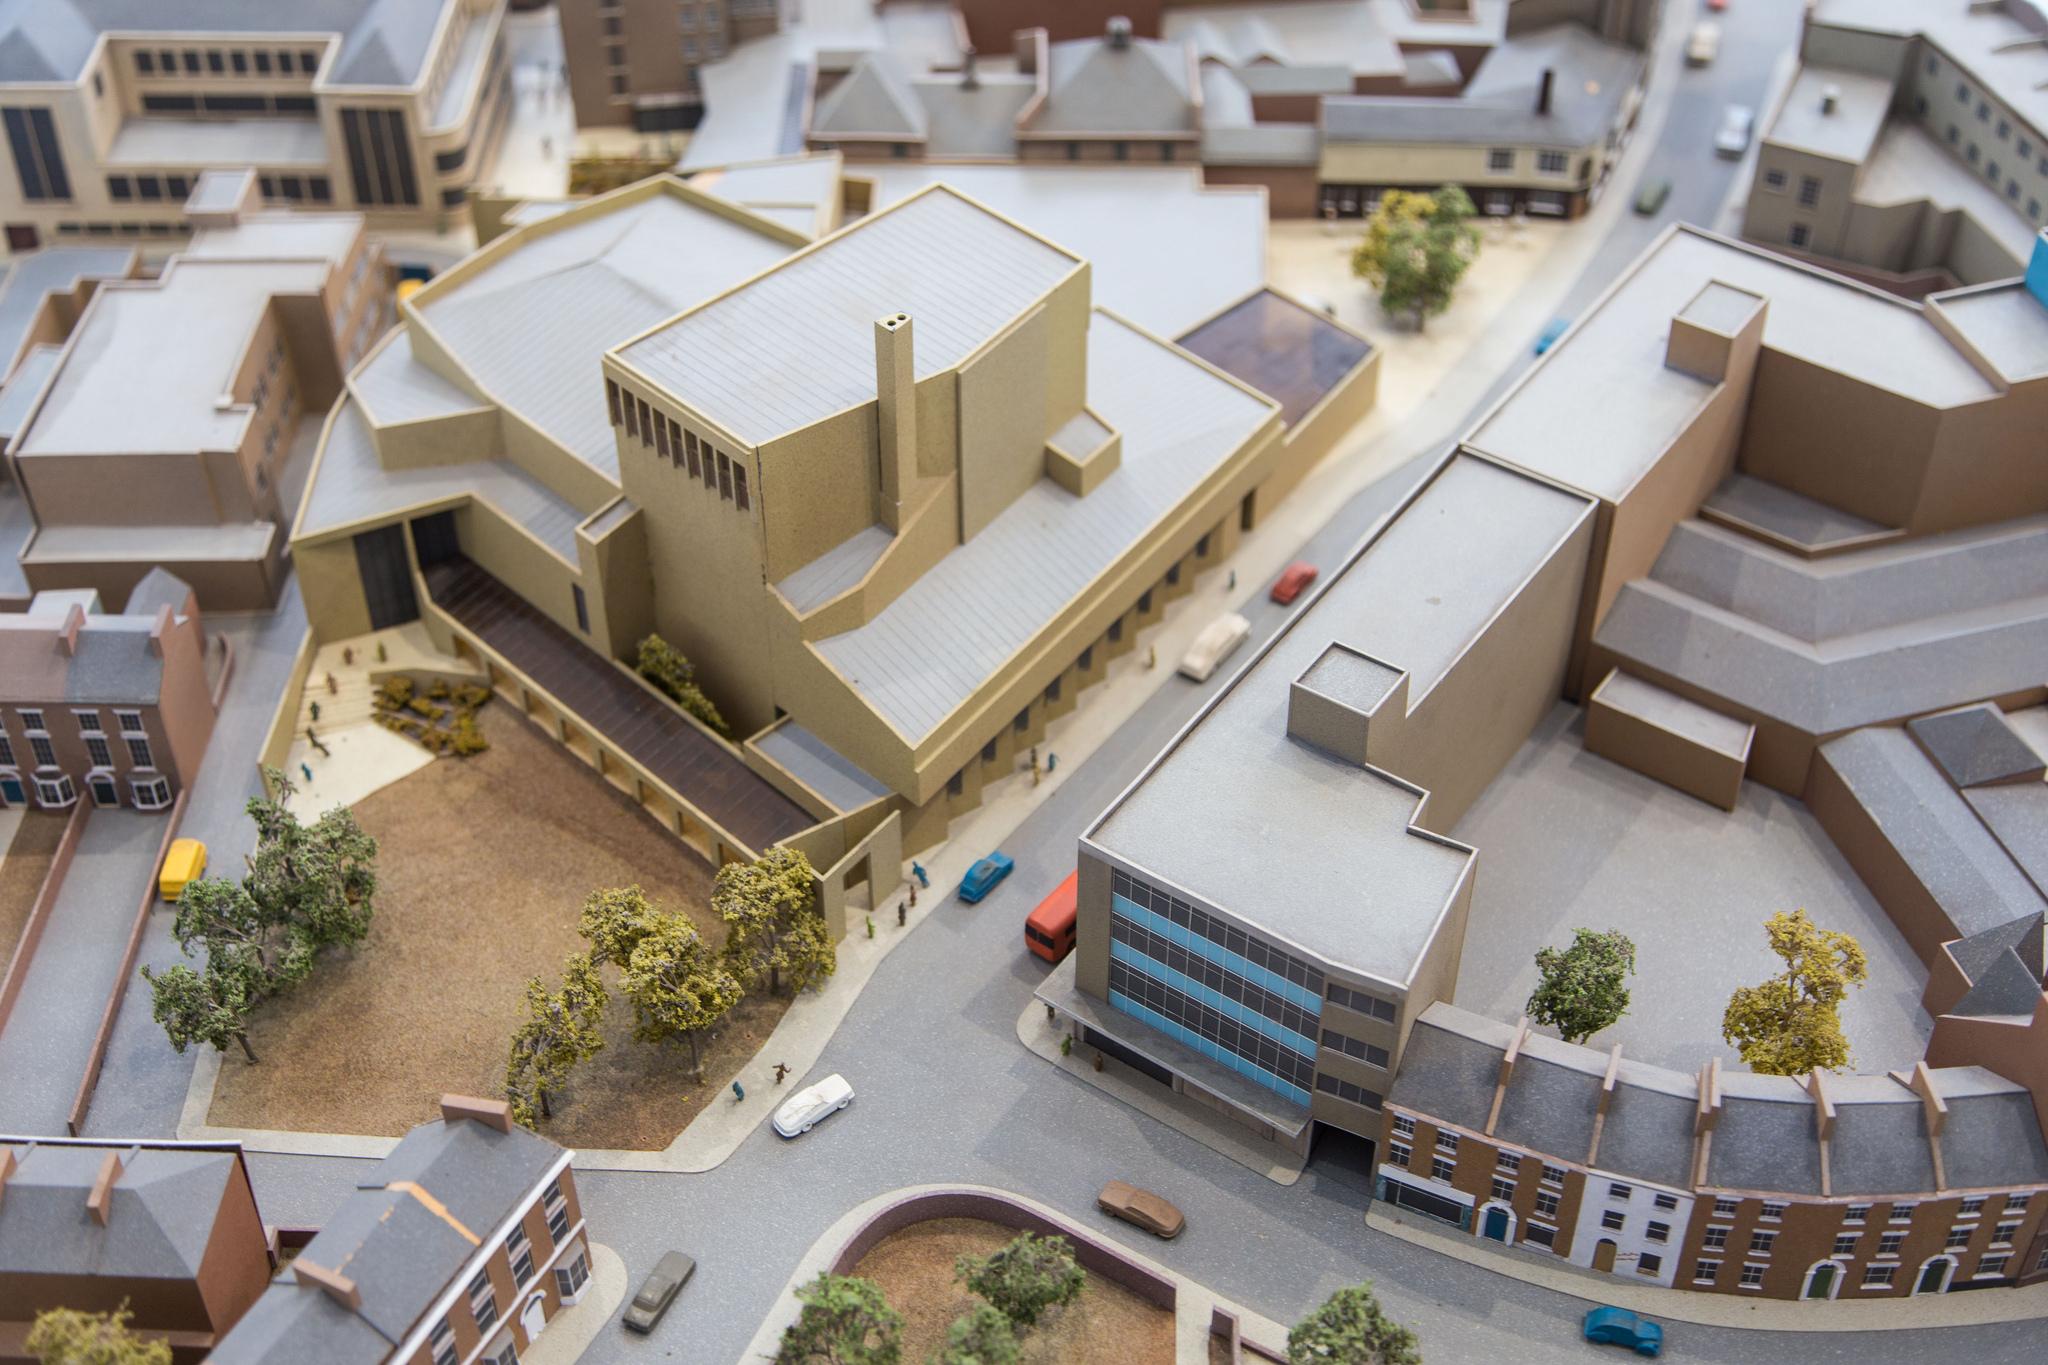 Jonbar-Archaeology-Architects-Model-details-2014